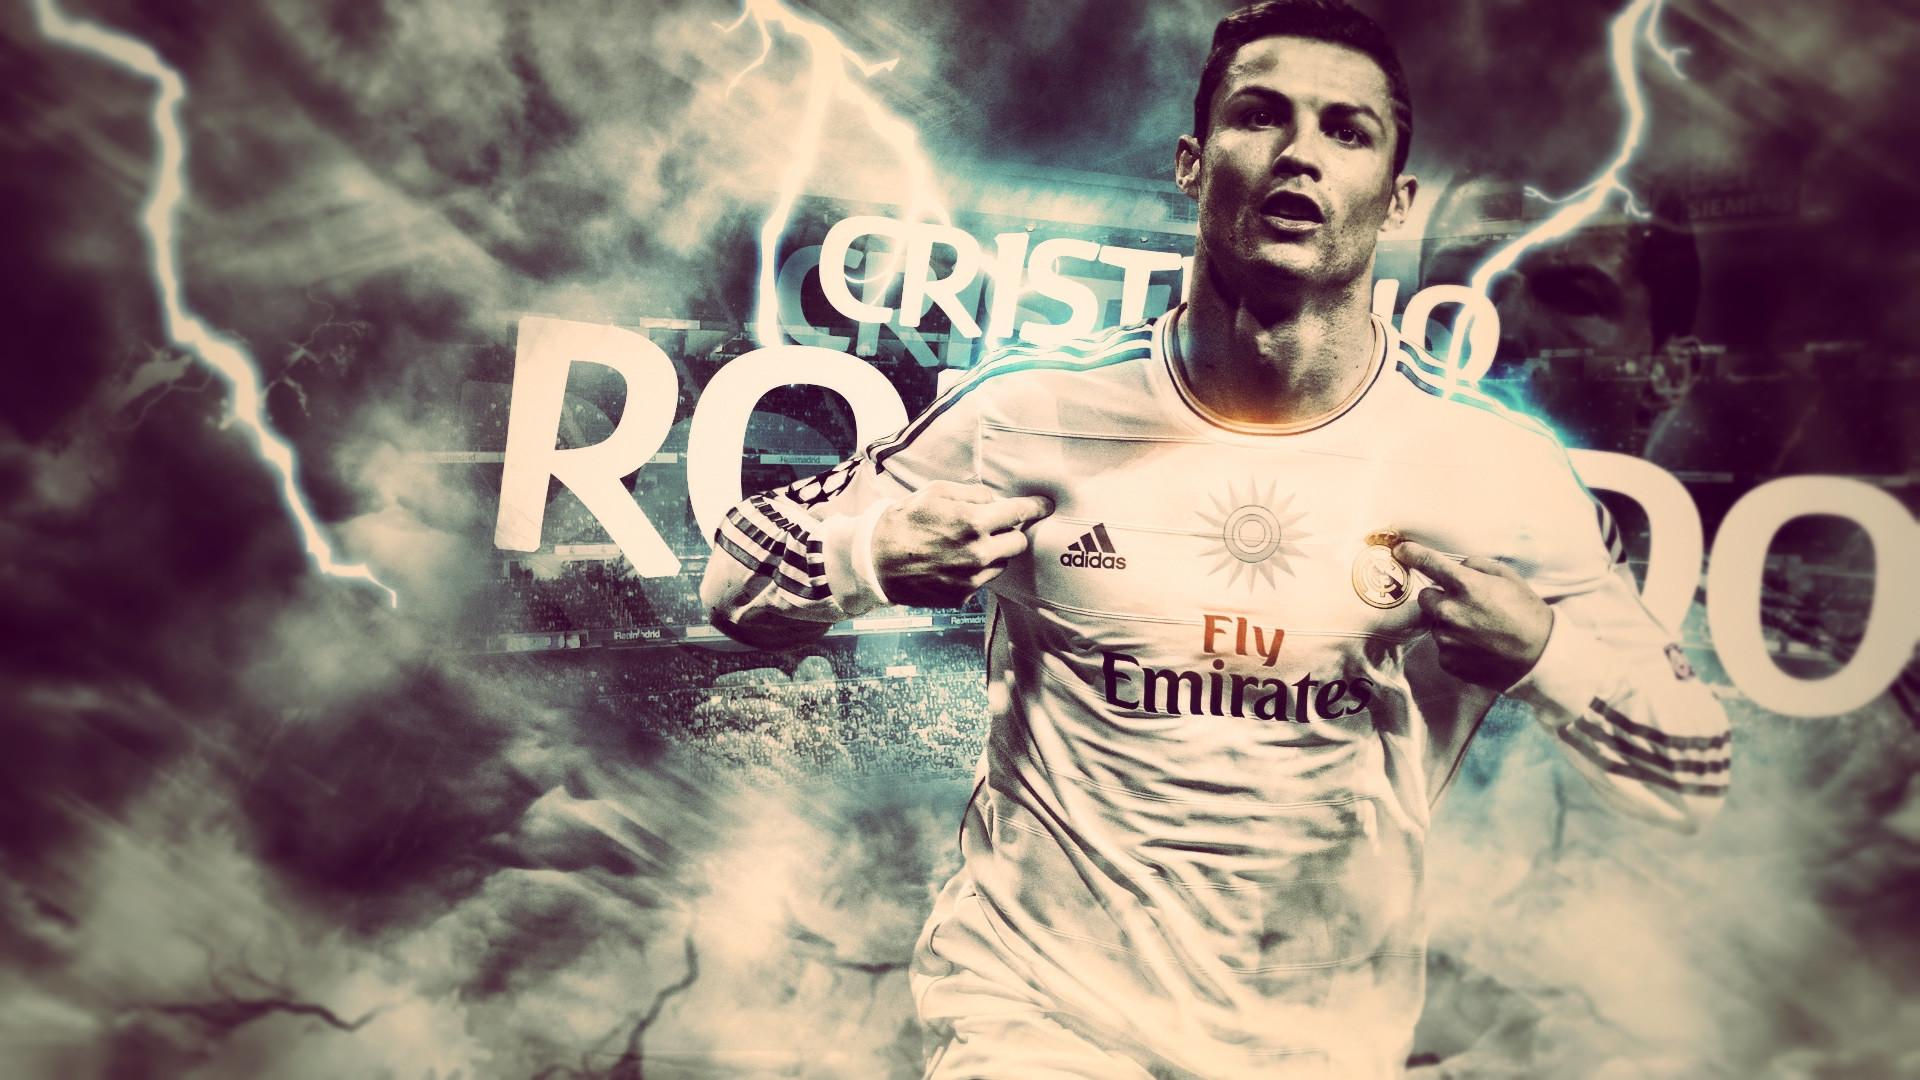 Live Cristiano Ronaldo Wallpapers | Cristiano Ronaldo Wallpapers Collection